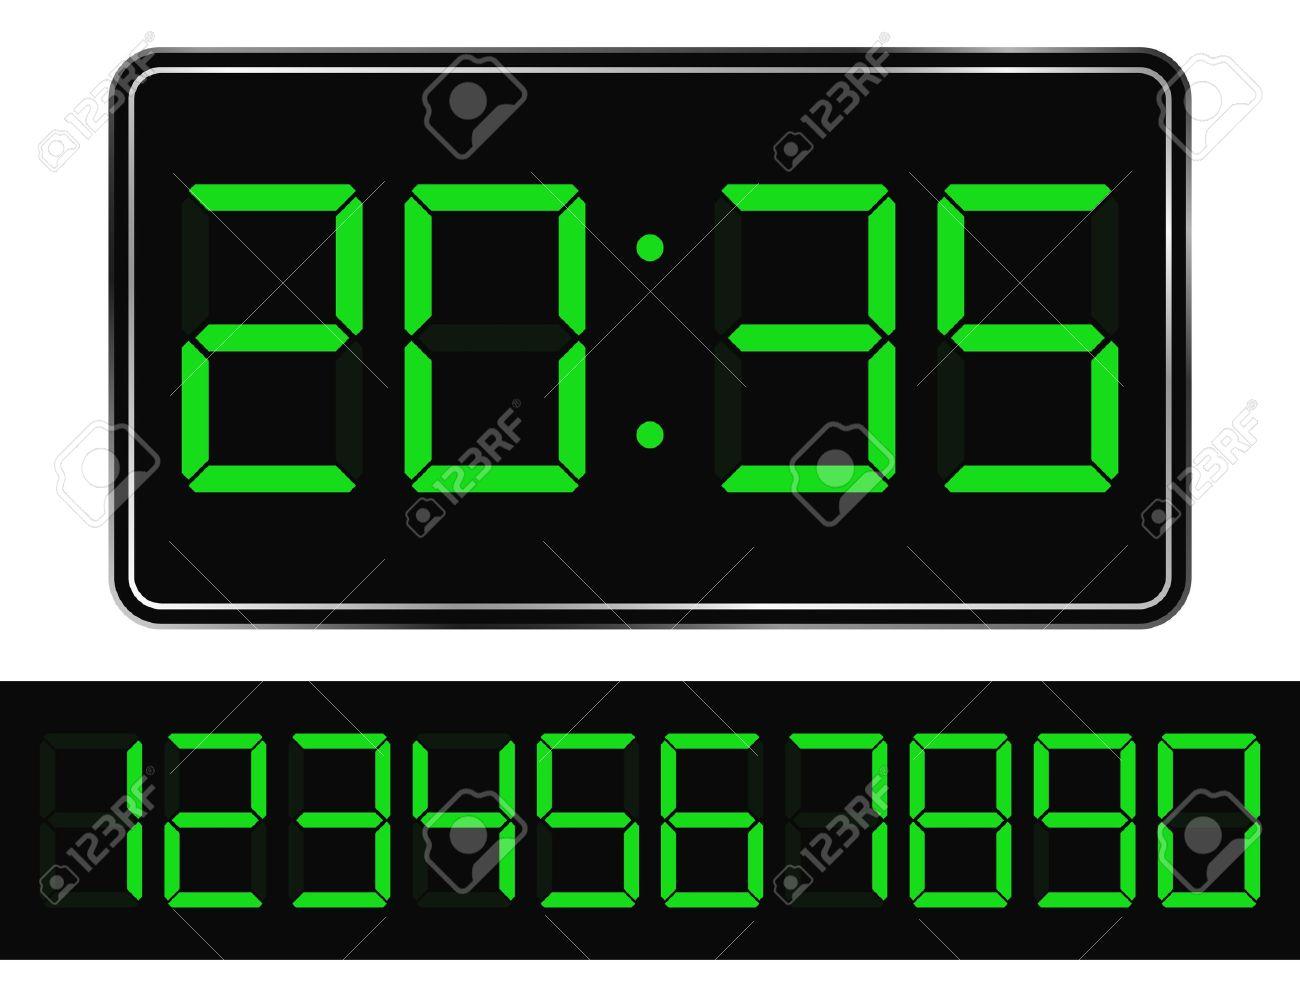 Vector Green Digital Clock Stock Vector - 10569806